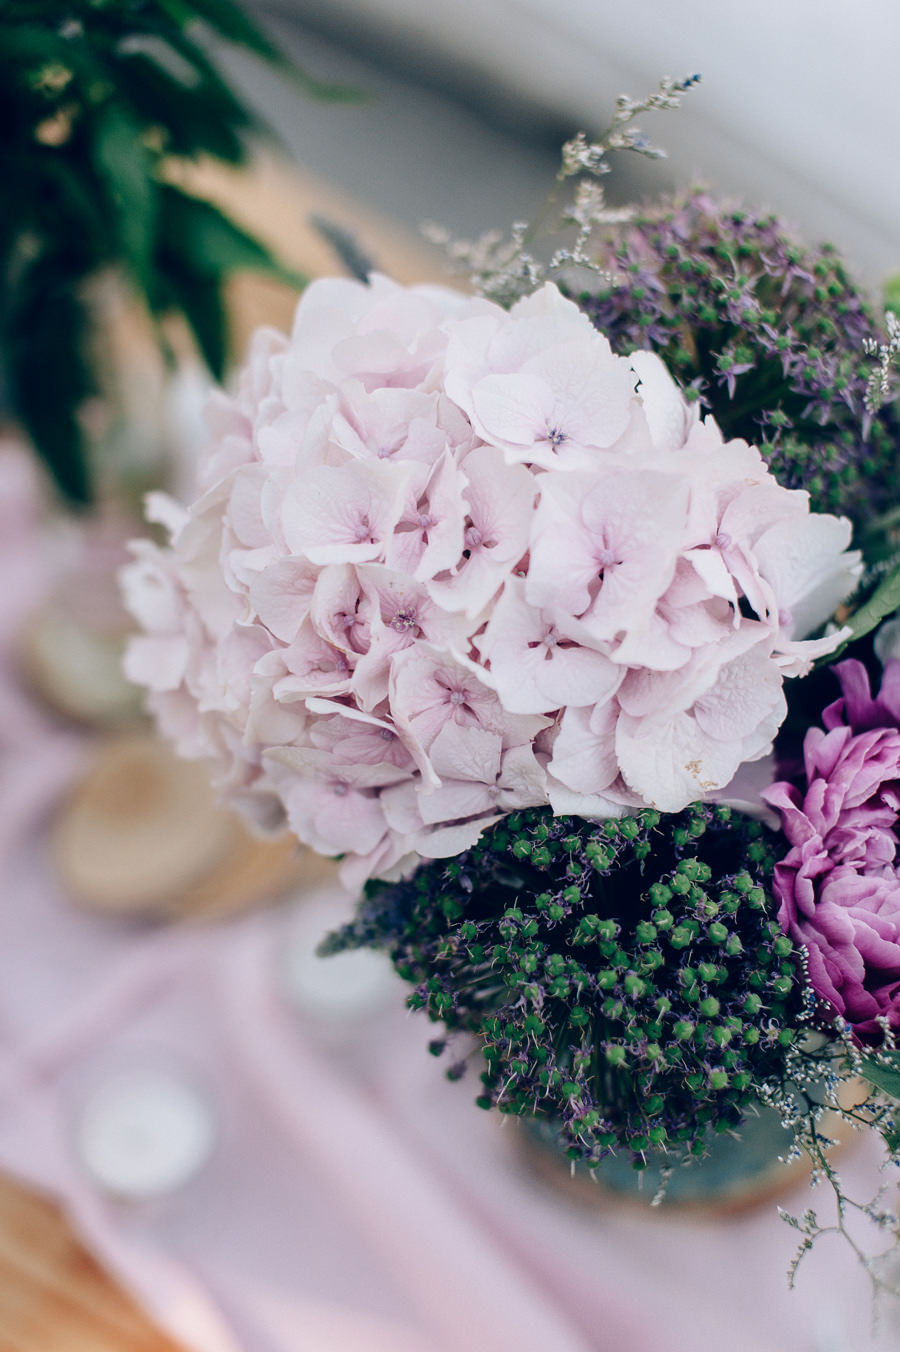 Flores para decorar tipis chill out 6